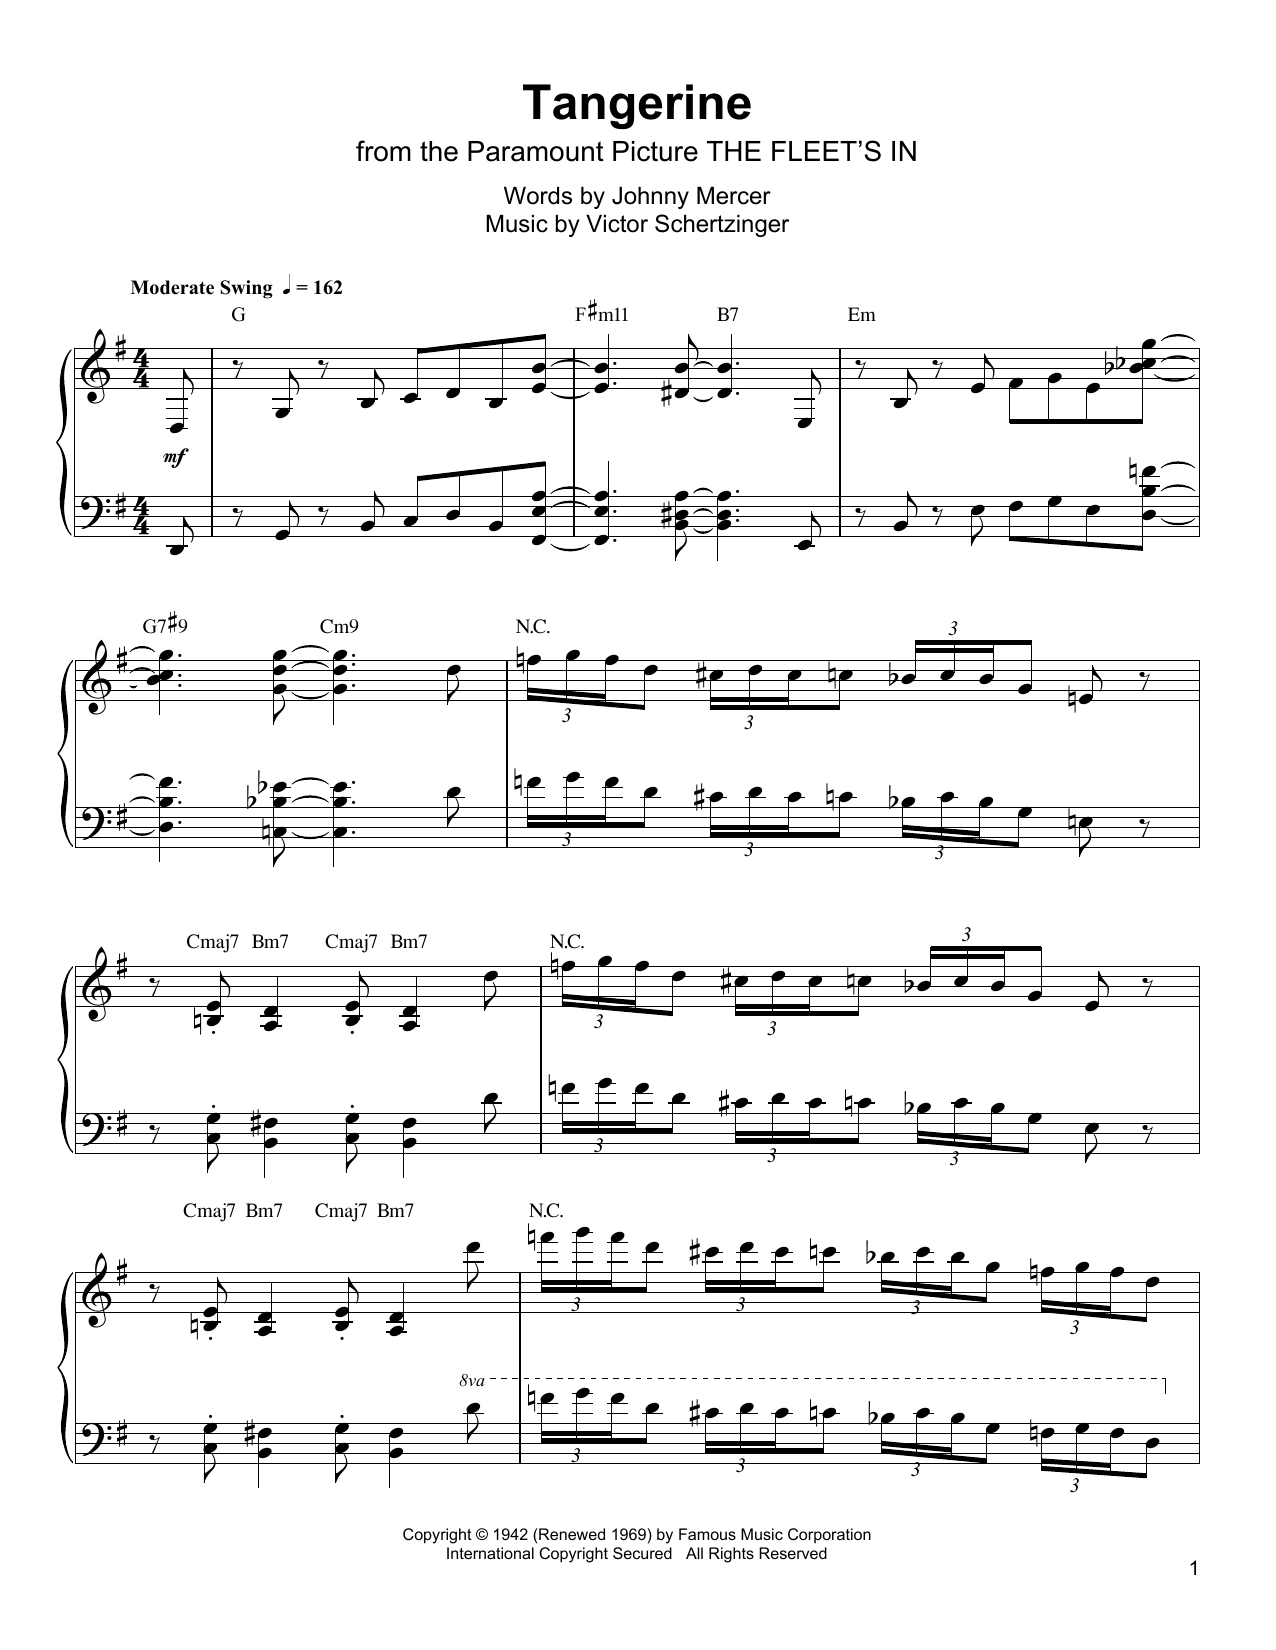 Tangerine Sheet Music